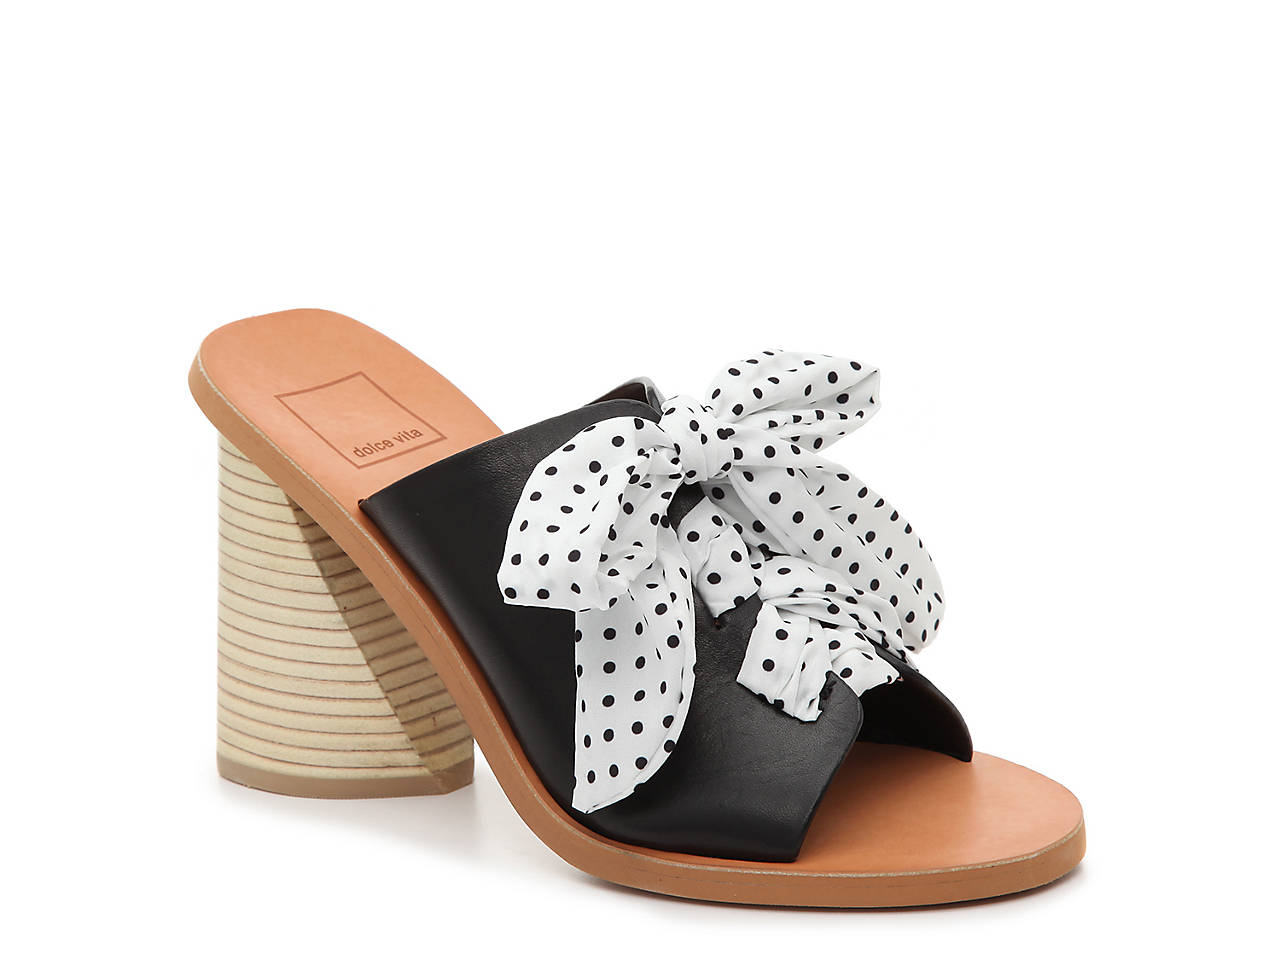 4d2a82b5d63a8 Dolce Vita Amber Sandal Women s Shoes